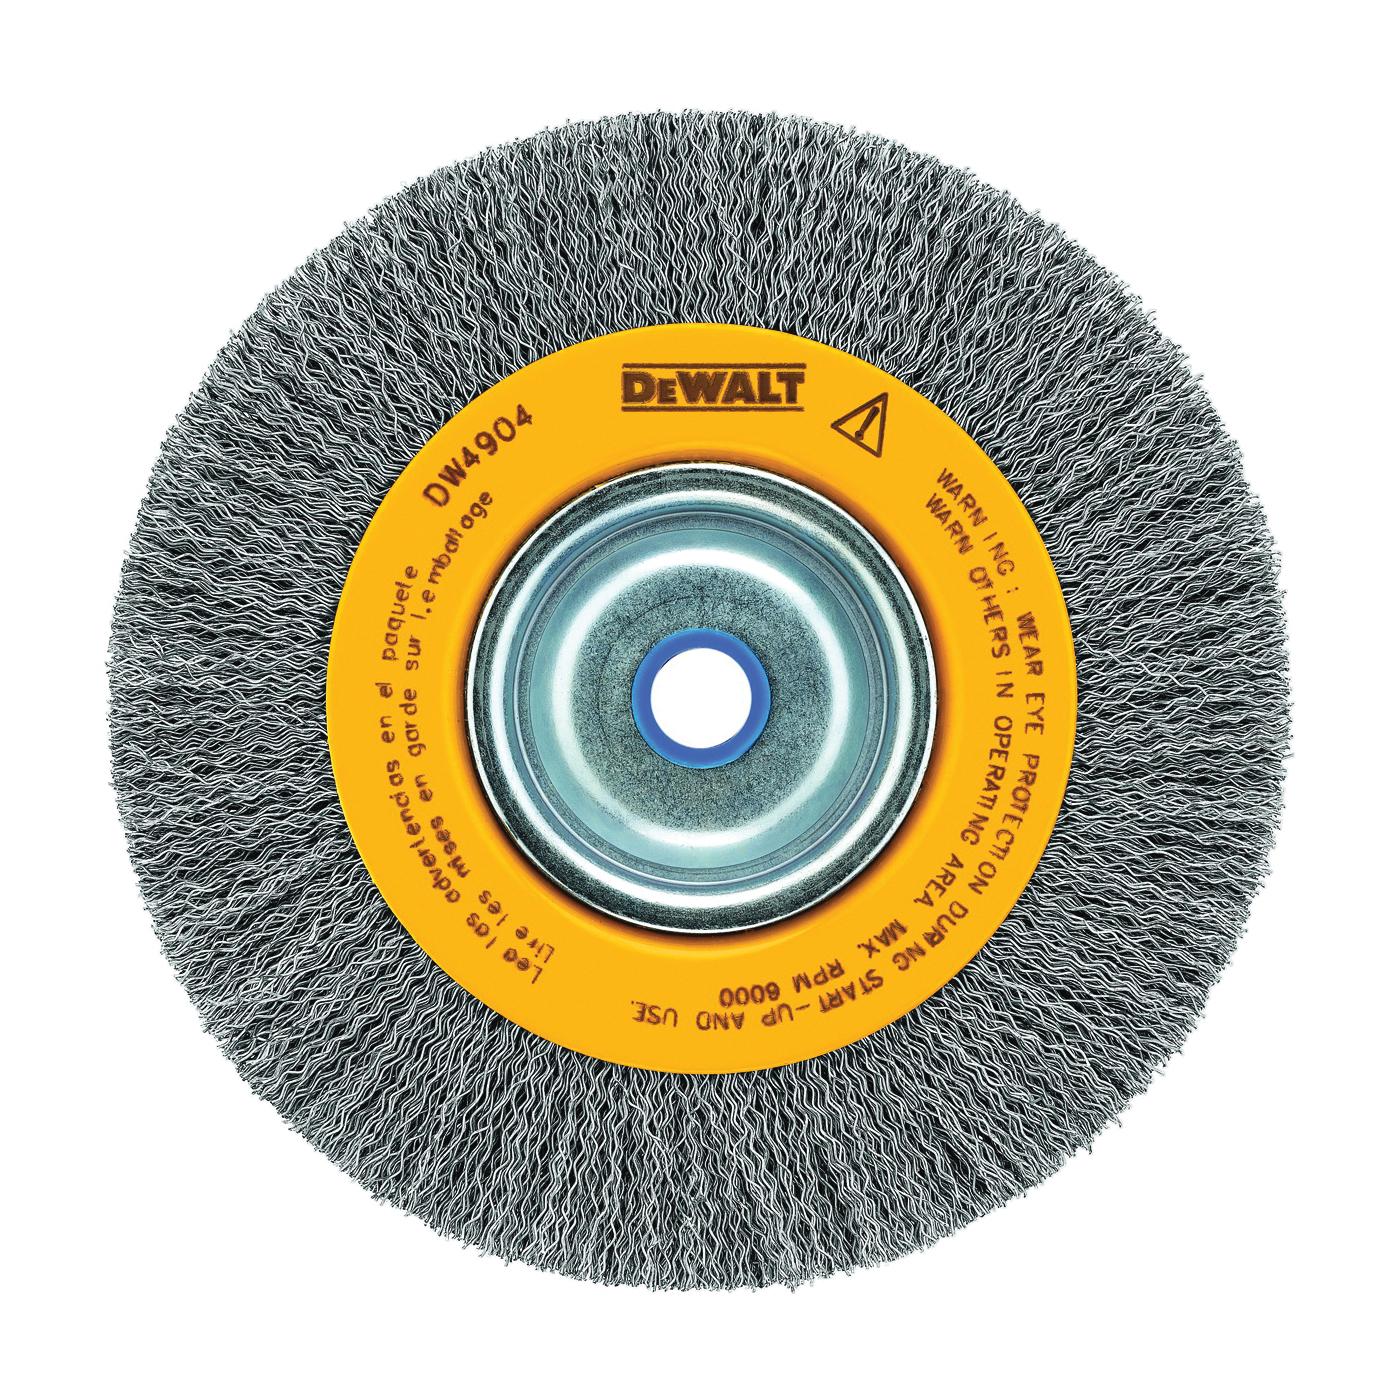 Picture of DeWALT DW4904 Wire Wheel Brush, 6 in Dia, 5/8 to 1/2 in Arbor/Shank, 0.014 in Dia Bristle